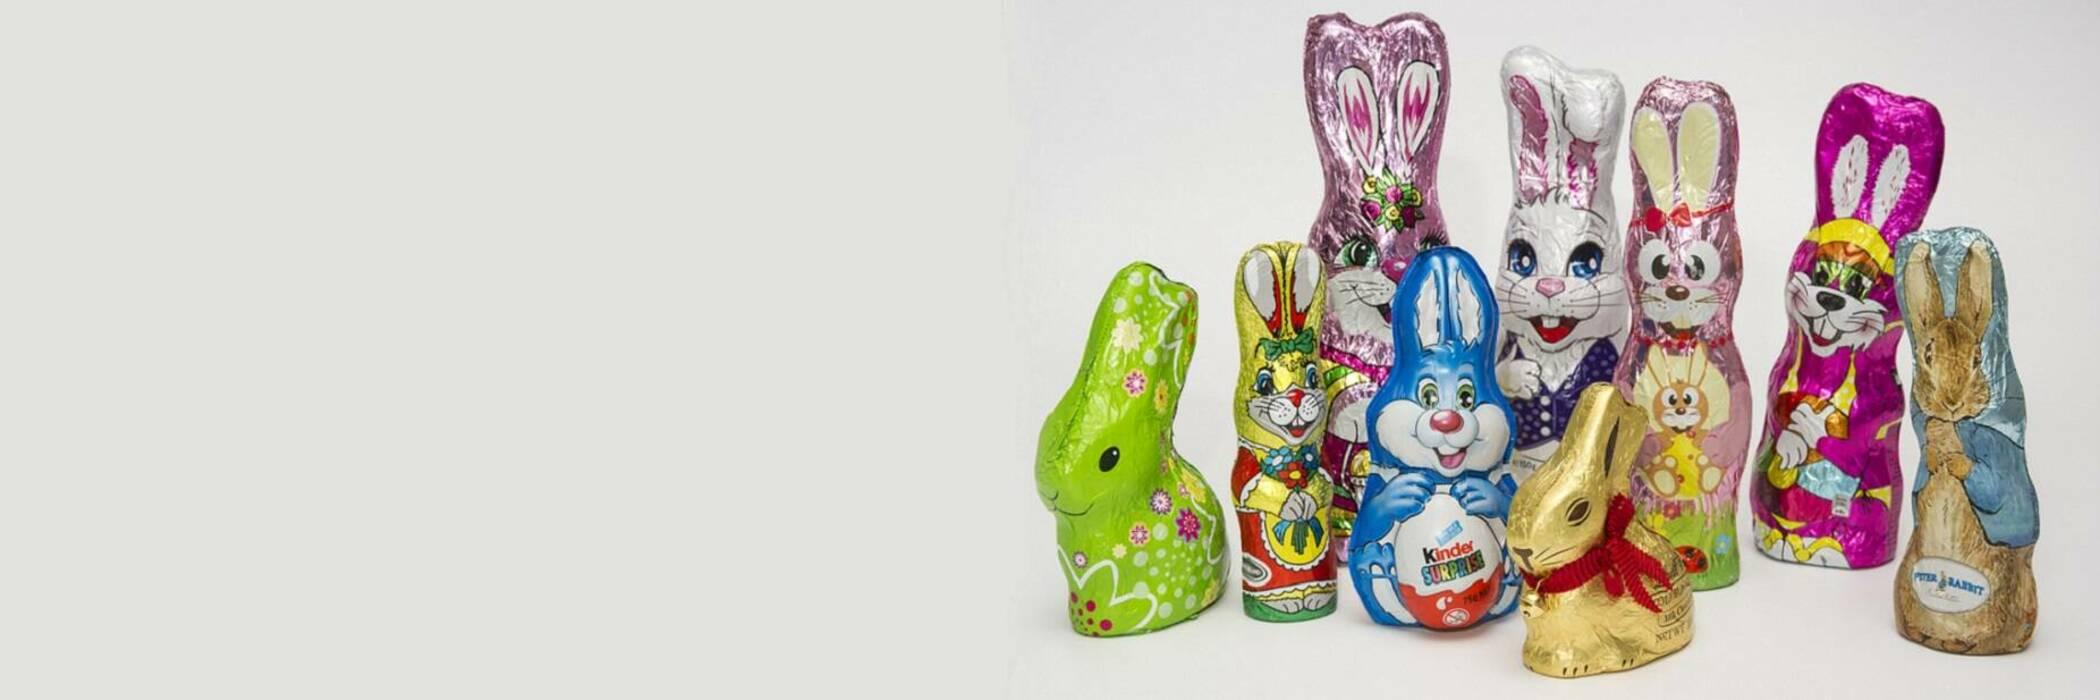 27mar choc easter bunnies hero